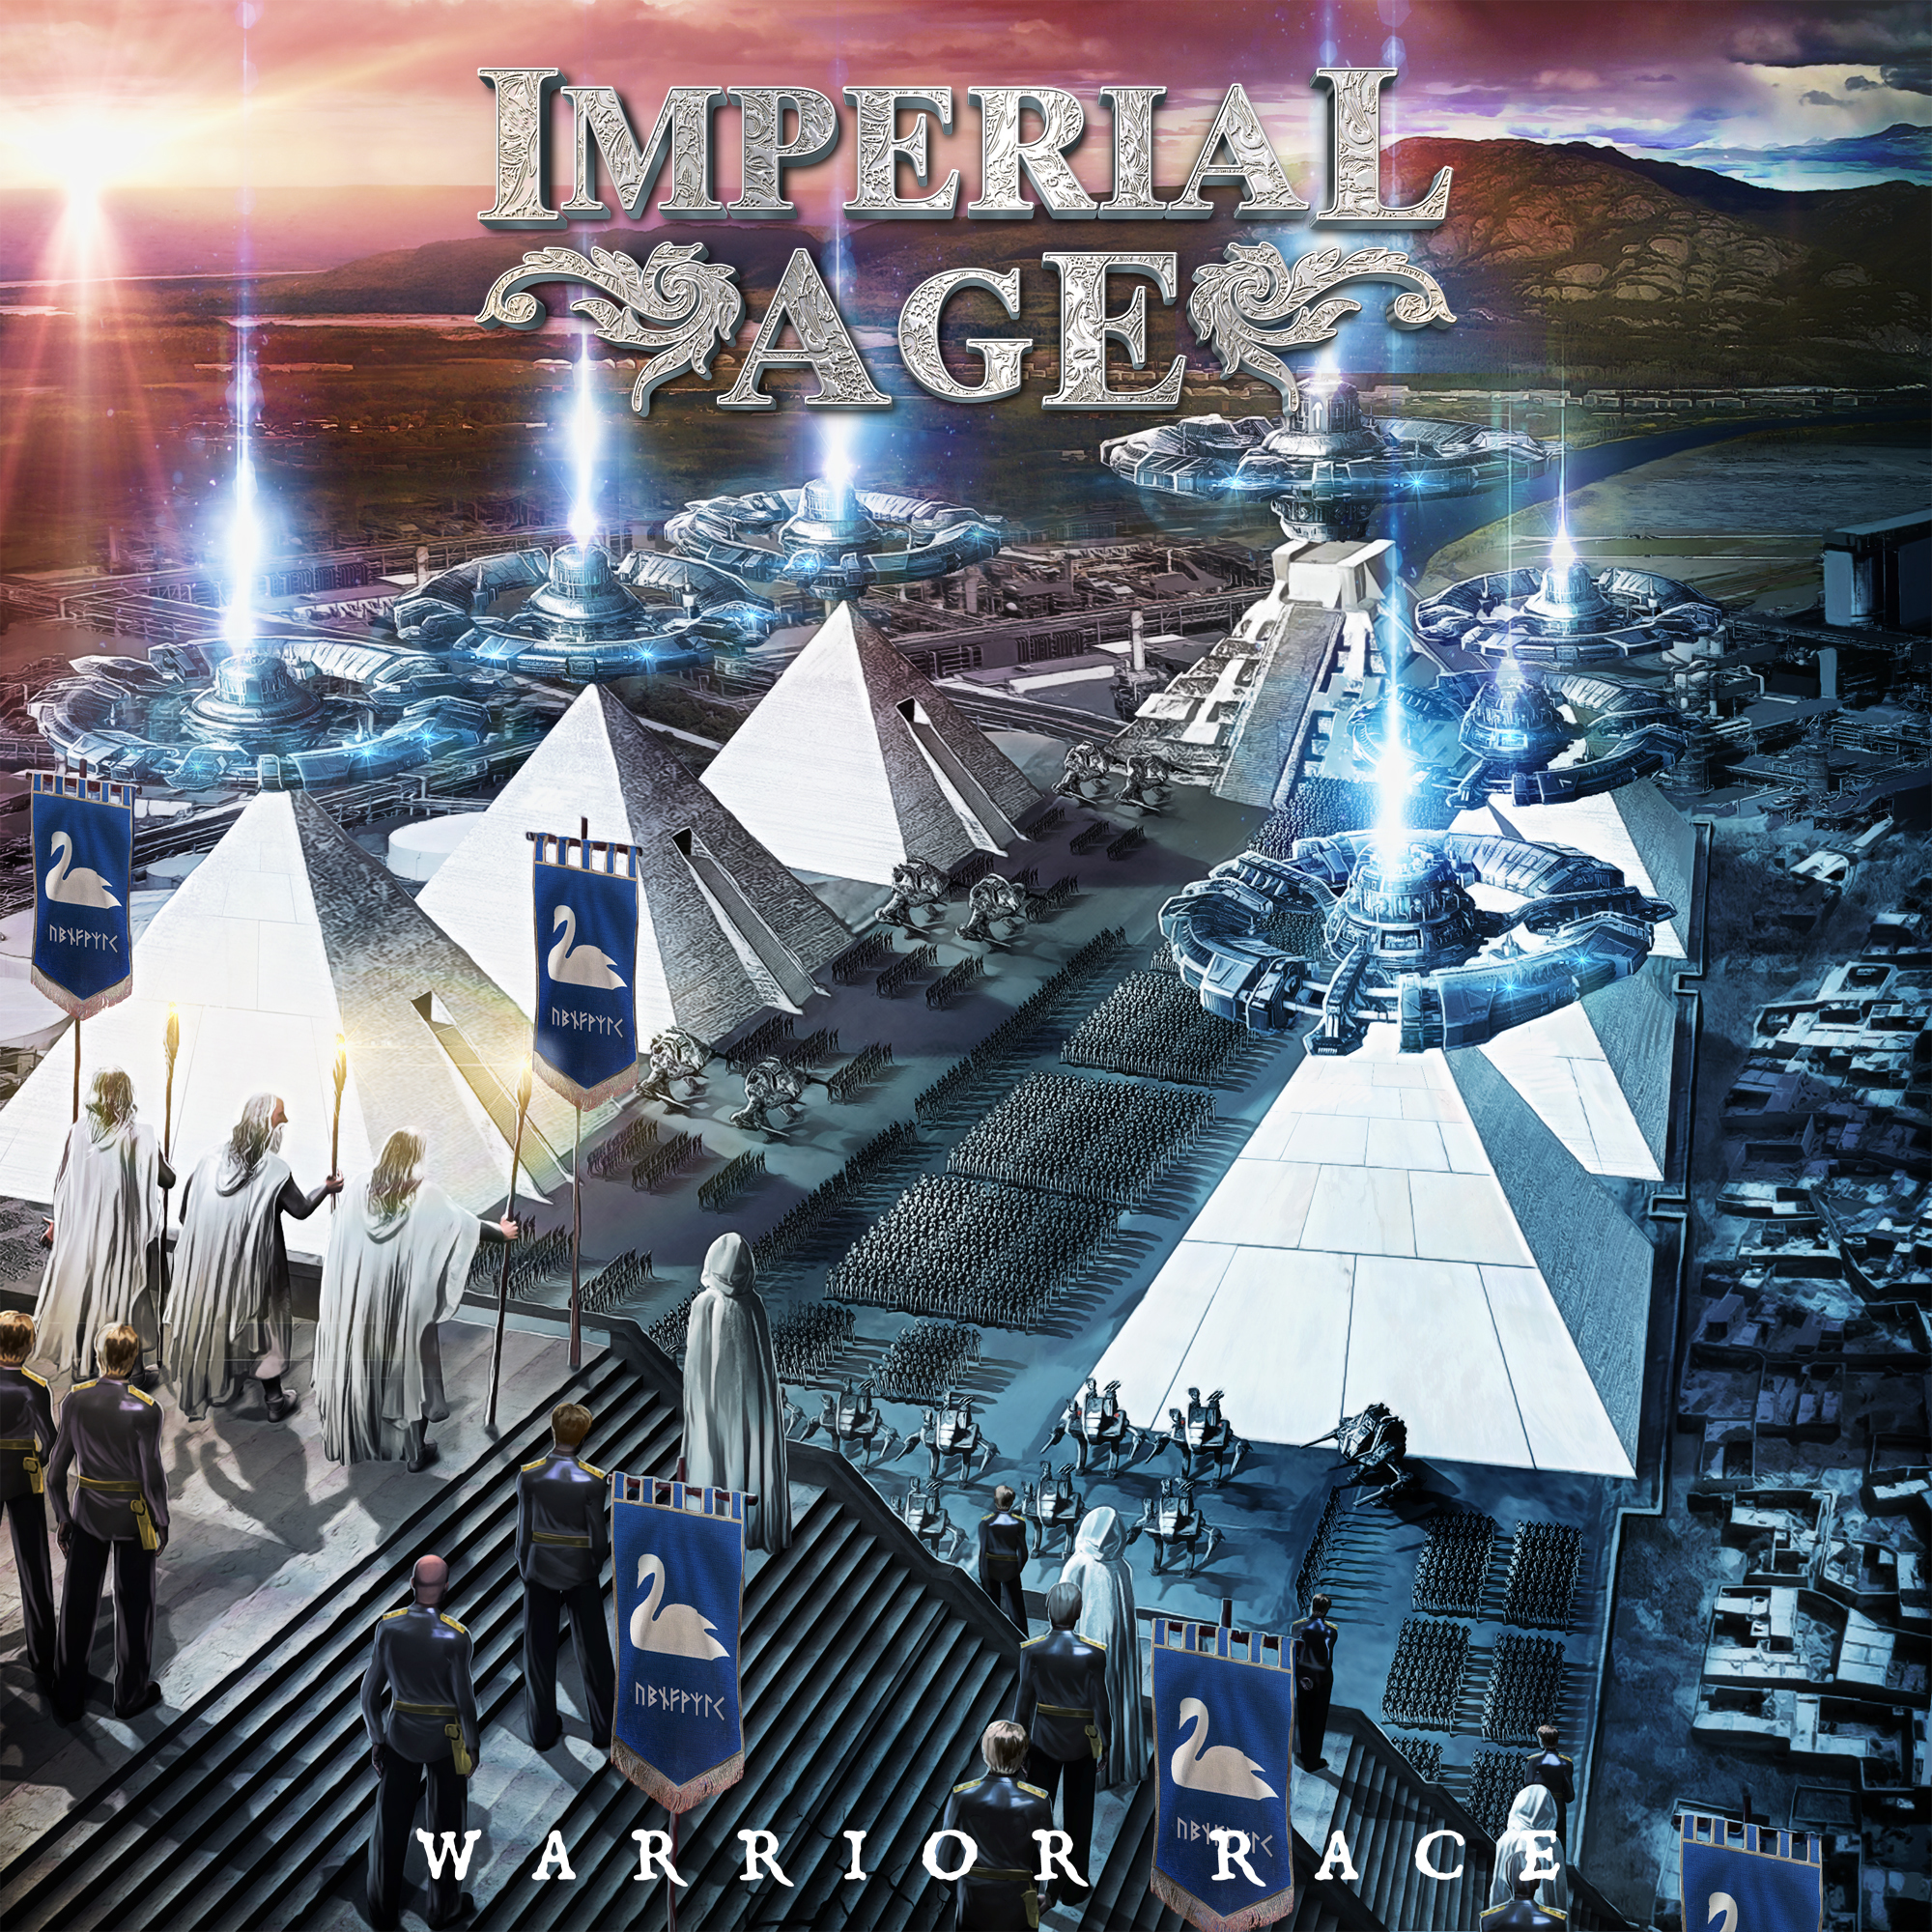 Warrior Race [CD Jewelcase] 000003